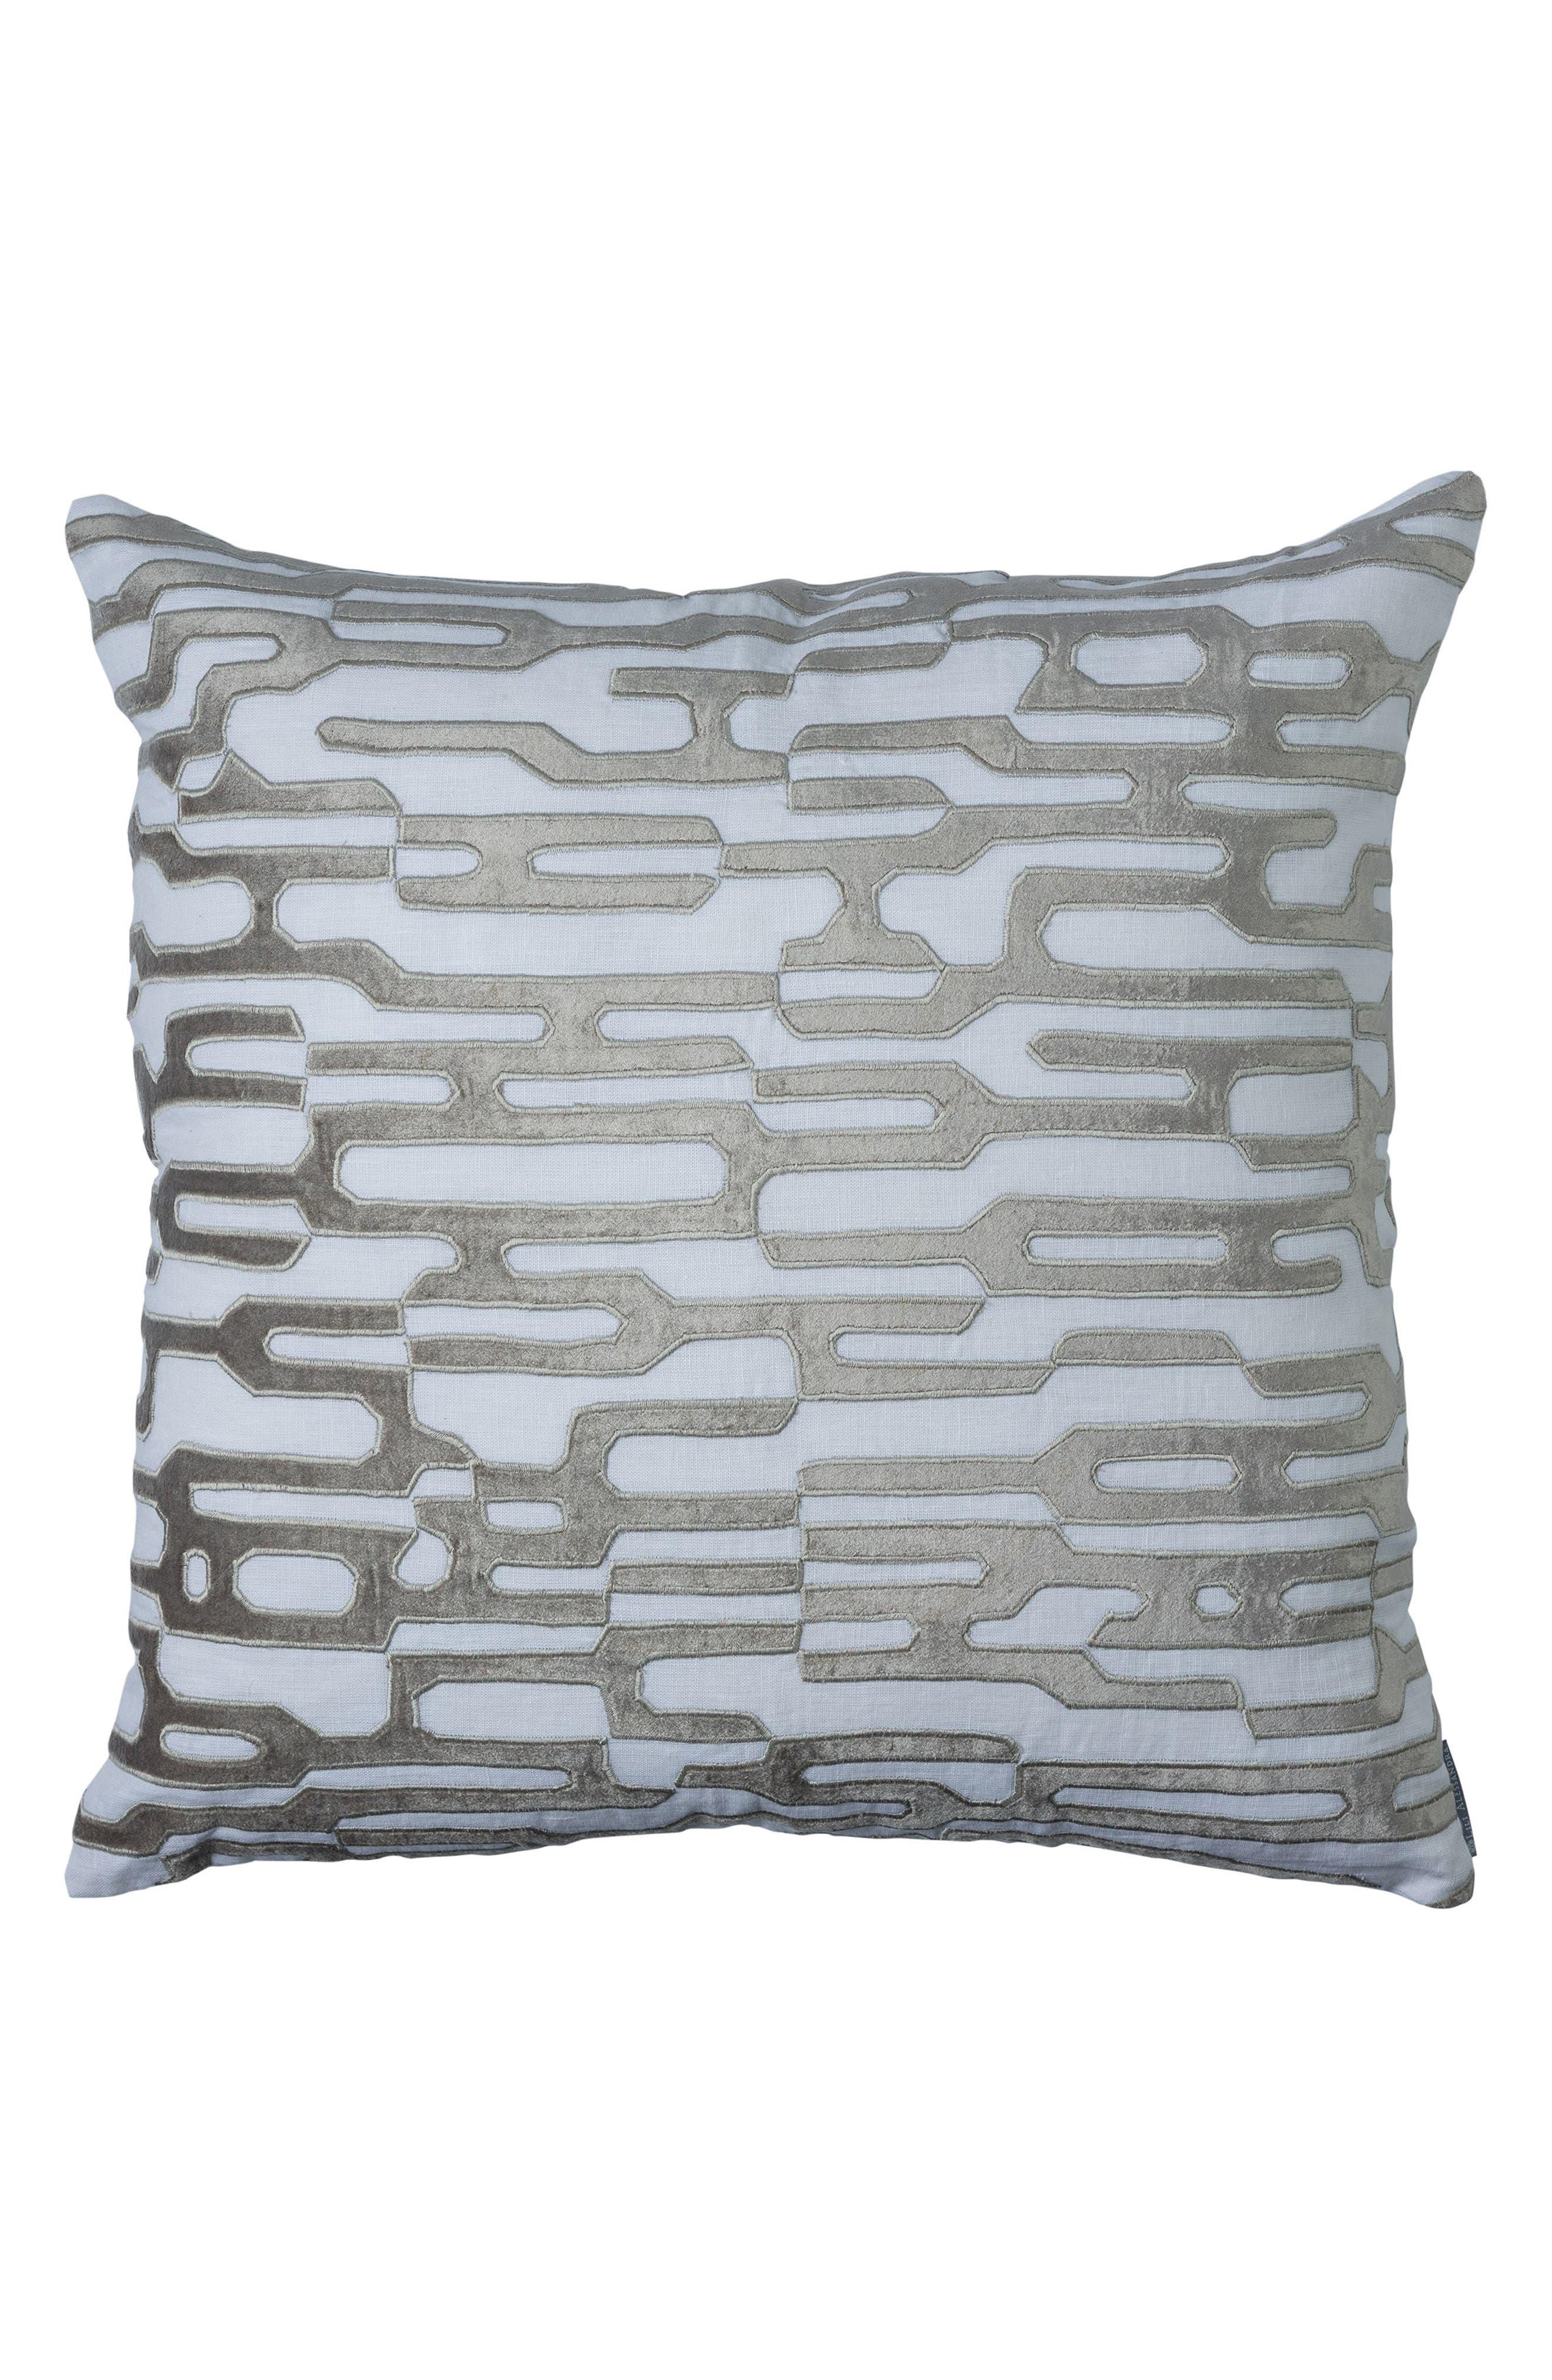 Lili Alessandra Christian Square Accent Pillow